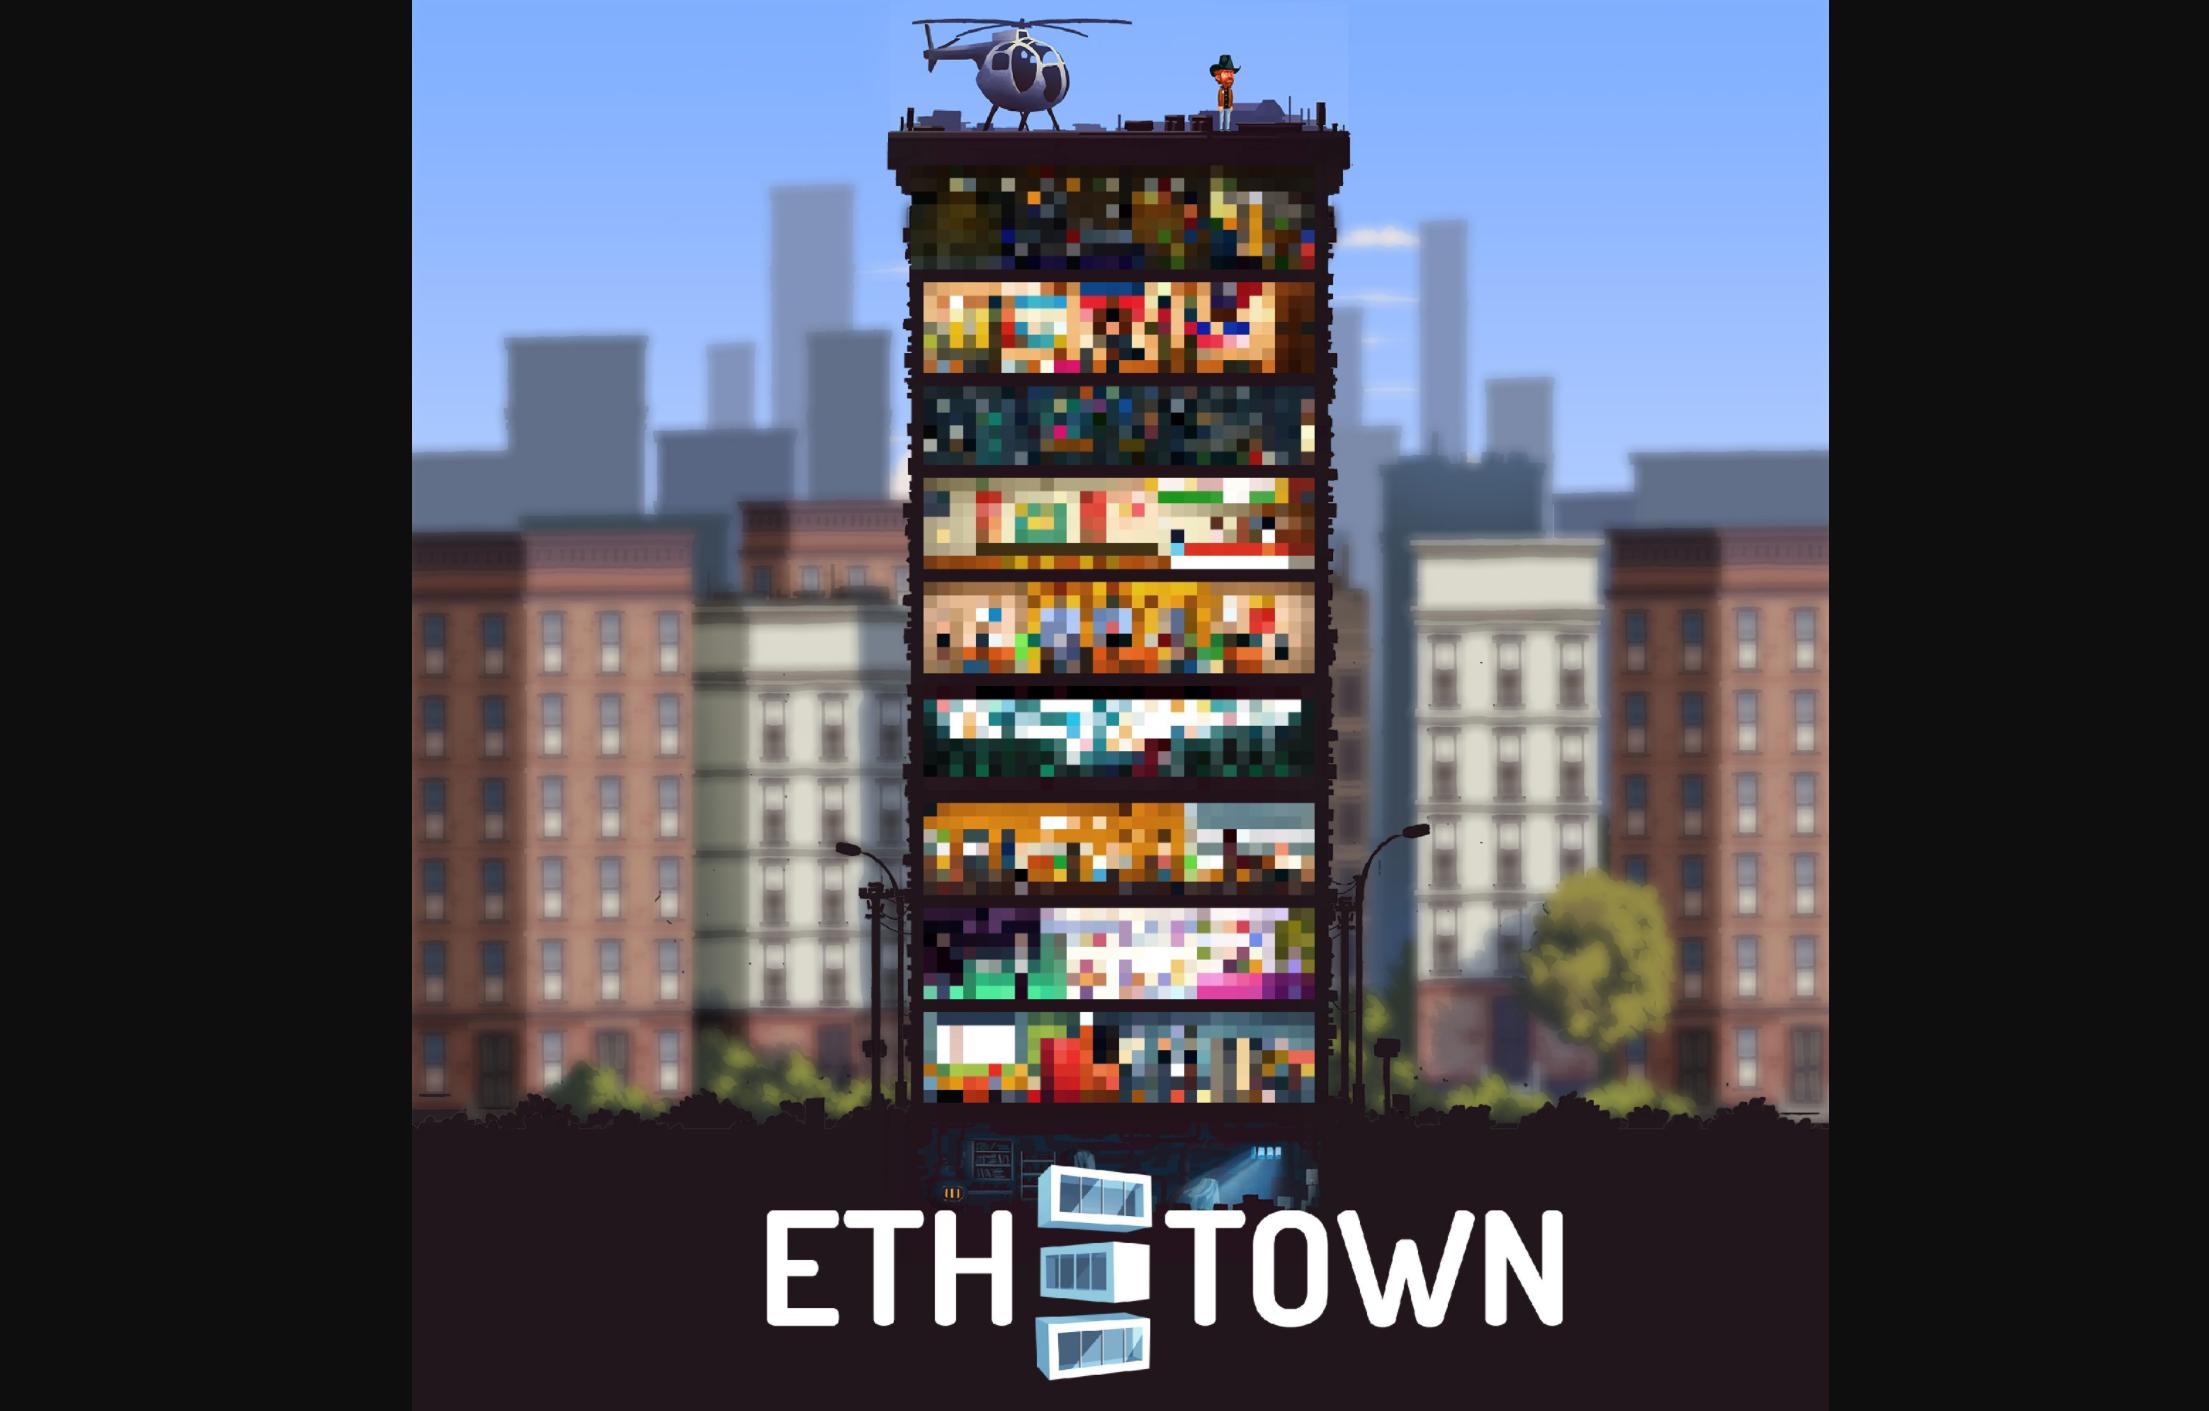 ethtown